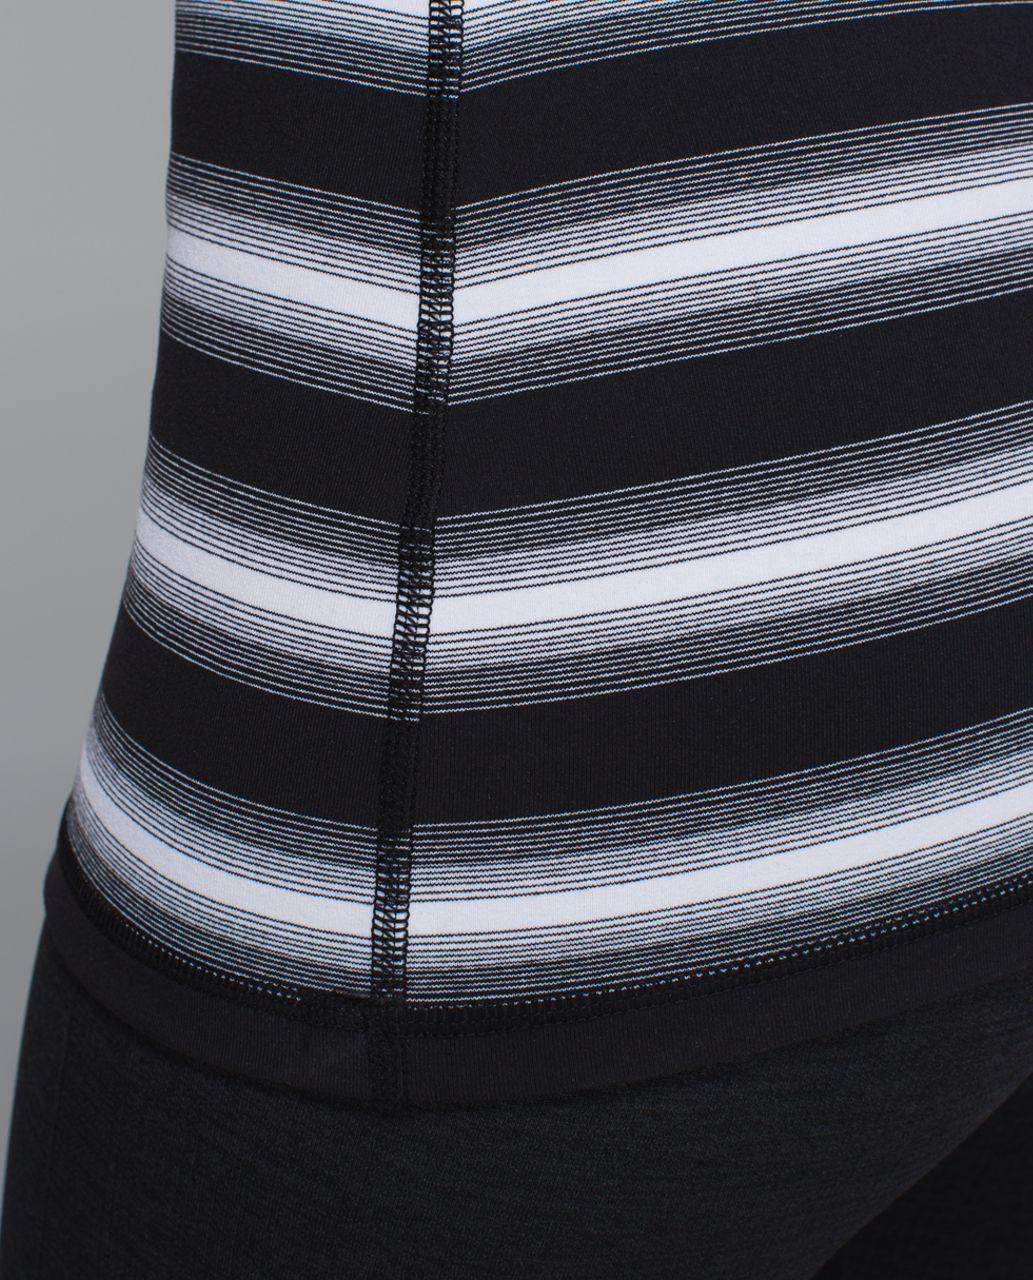 Lululemon Power Y Tank *Luon - Capilano Stripe Black White